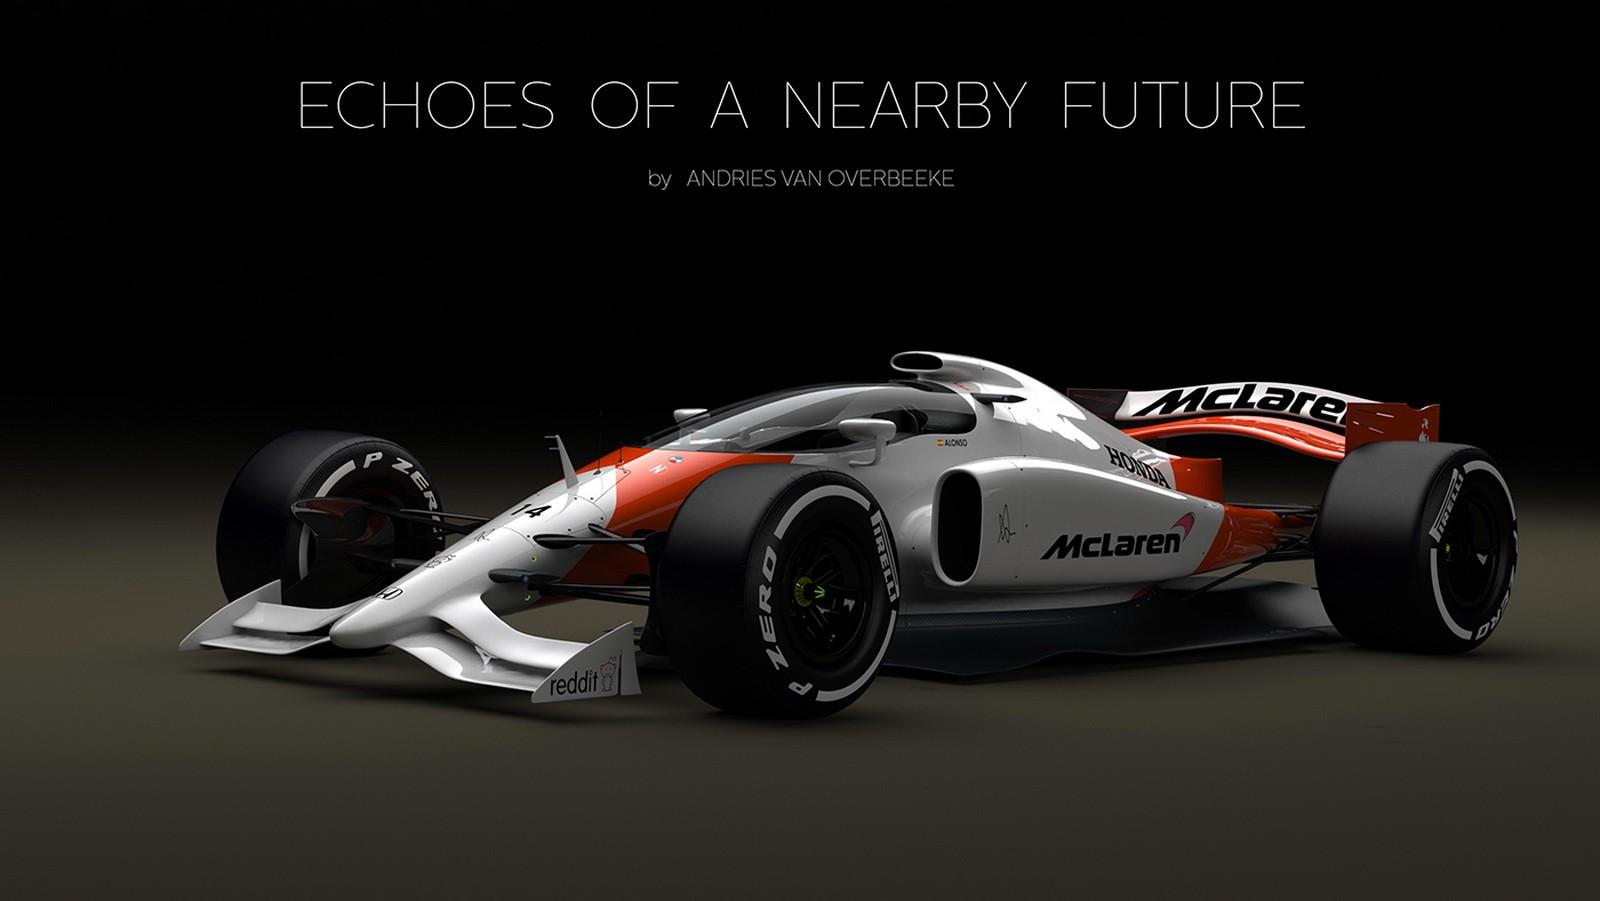 future-formula-1-concept-earns-closed-cockpit-honda-mclaren-livery-photo-gallery_1